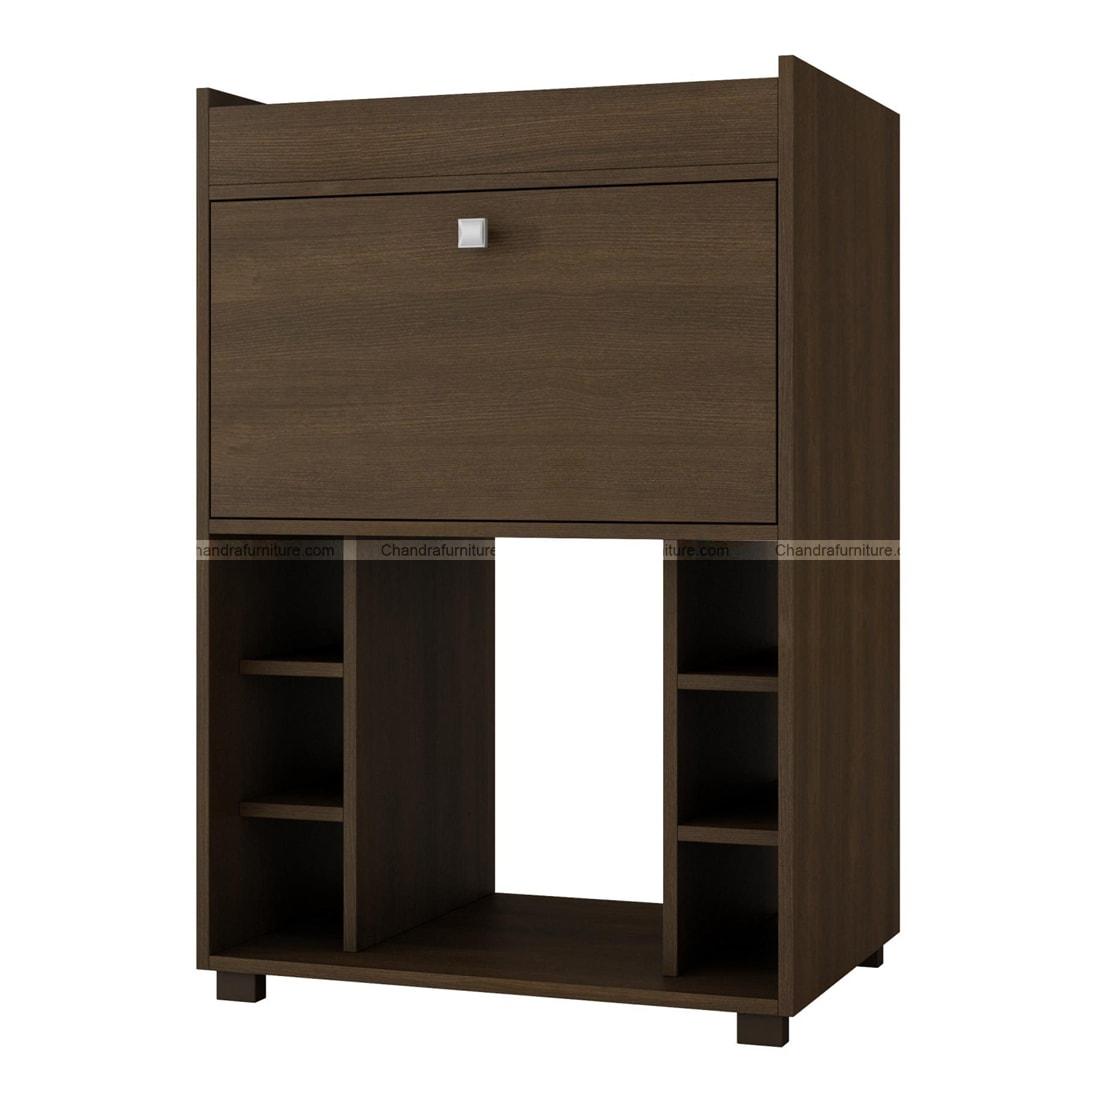 Chandra Furniture Shochu Bar Cabinet With Bottle Holder In Brown Finish